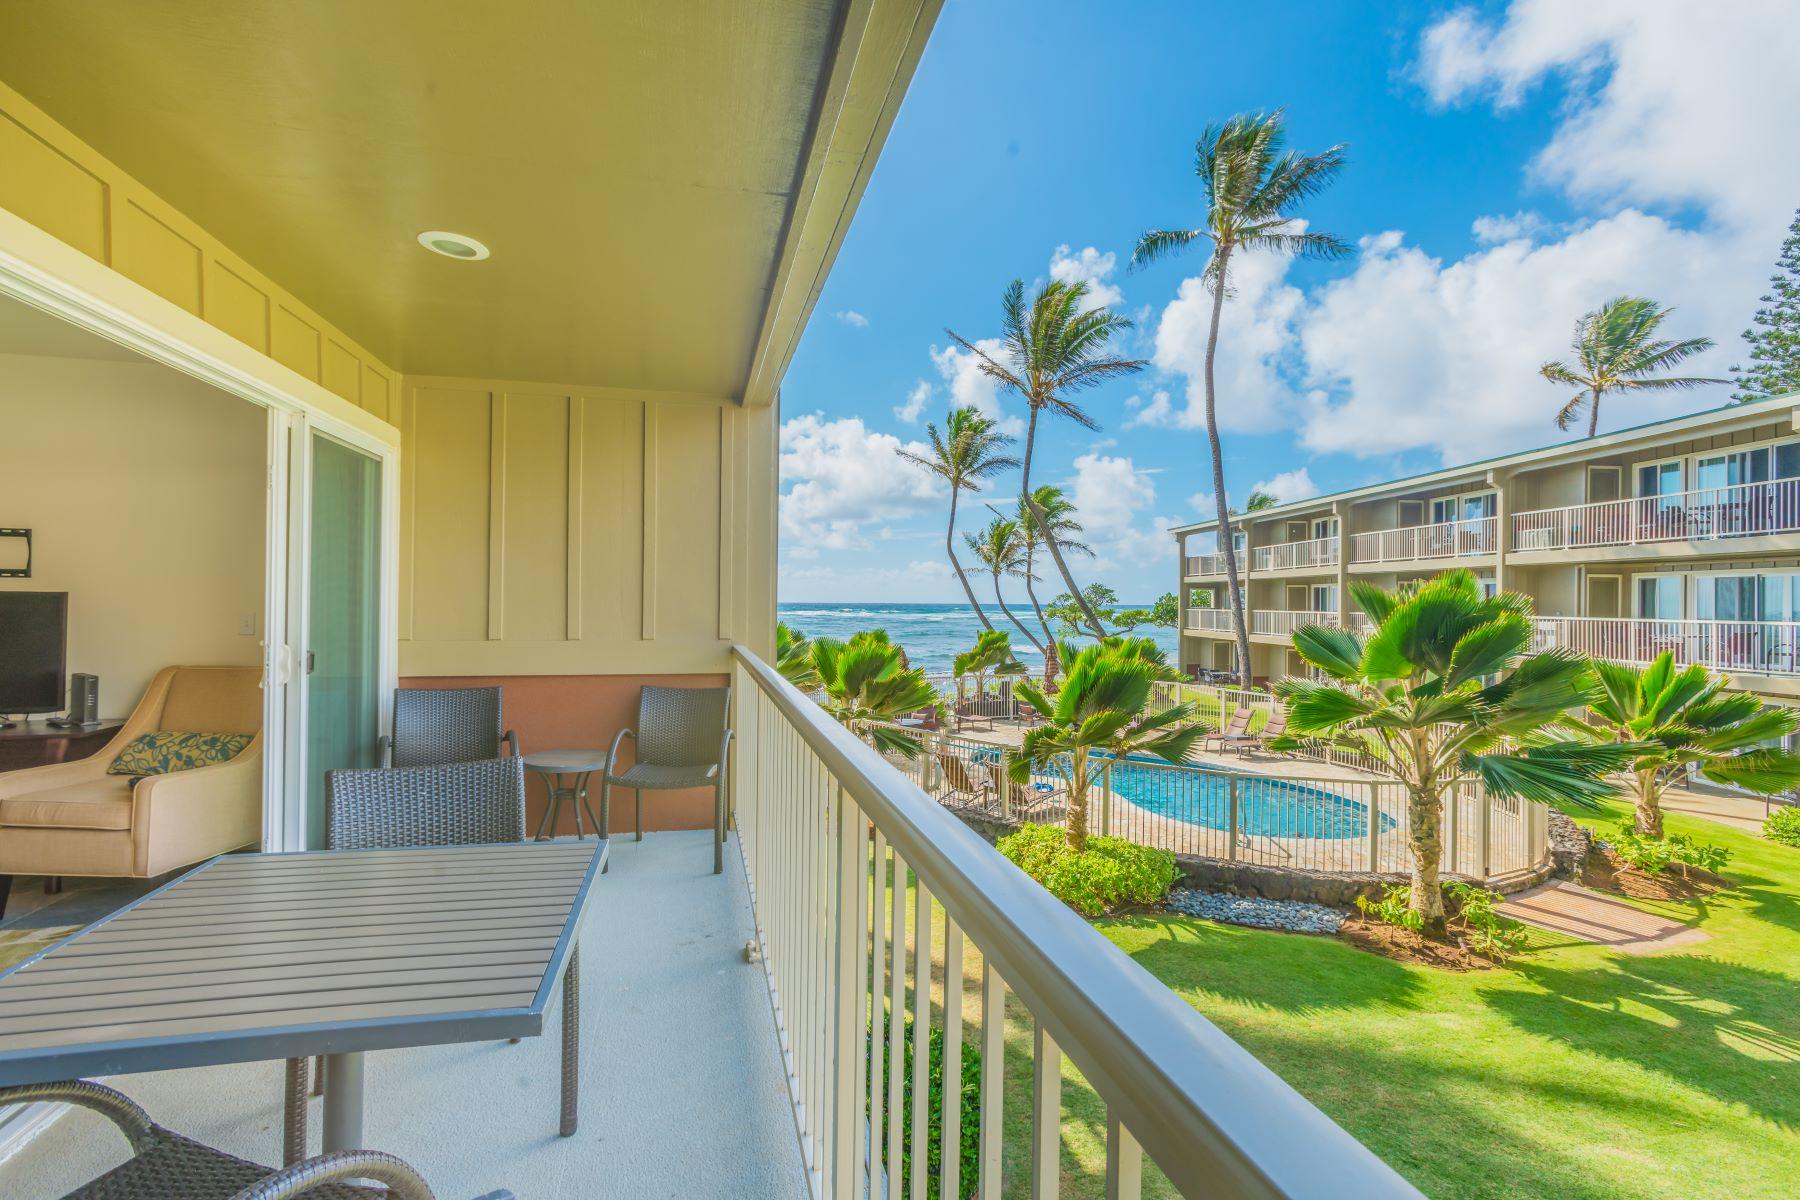 Condominiums 為 出售 在 Kauai Kailani #212 4-856 Kuhio Highway #212, Kapaa, 夏威夷 96746 美國